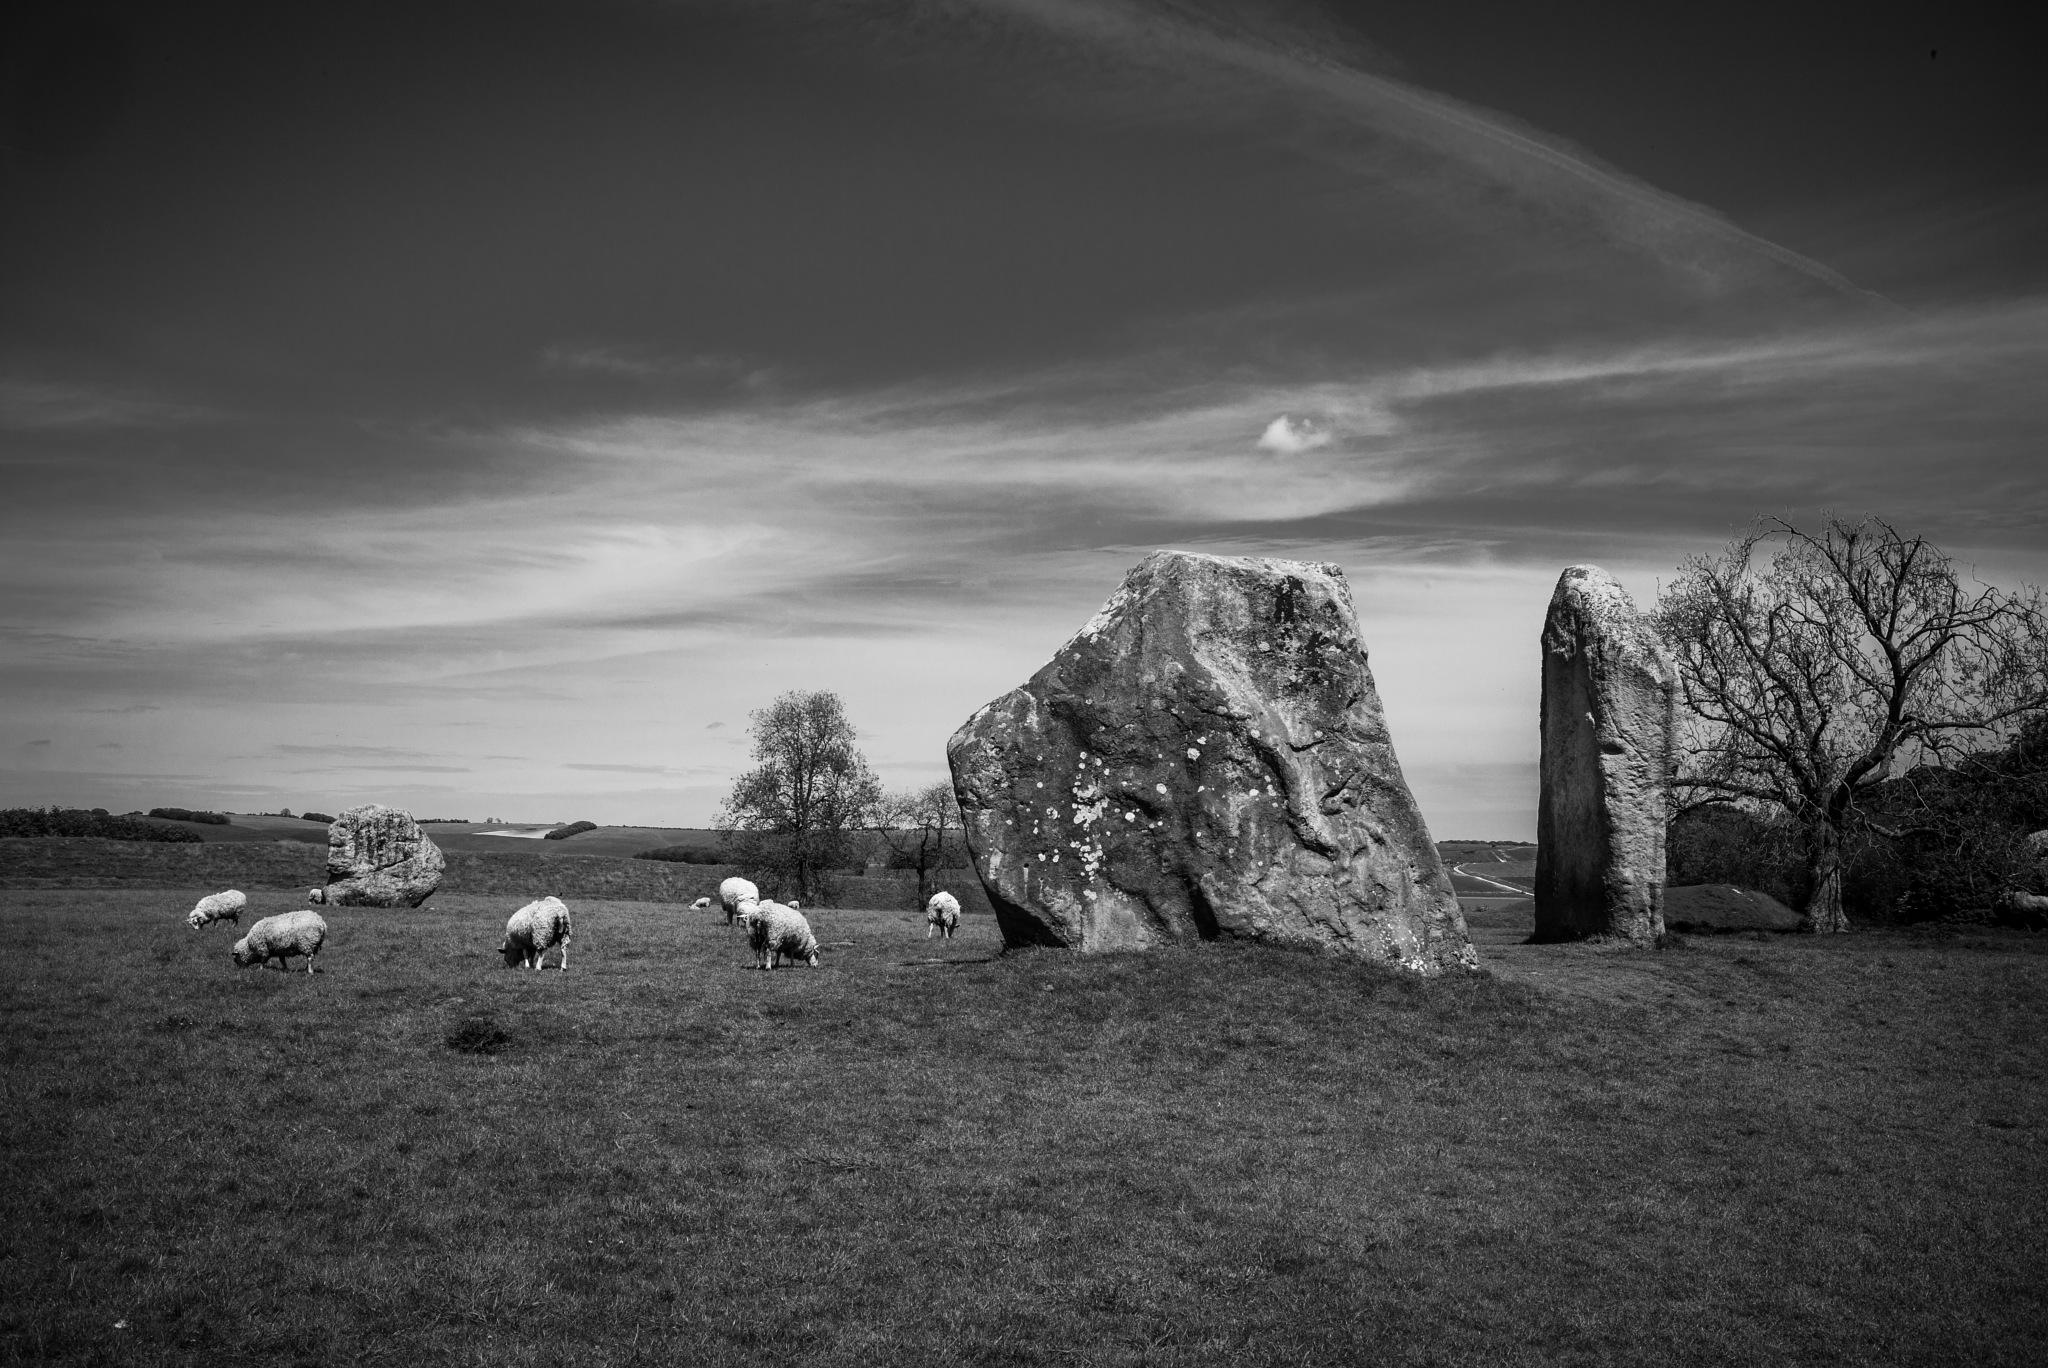 avebury stone circle 2 by hutchst